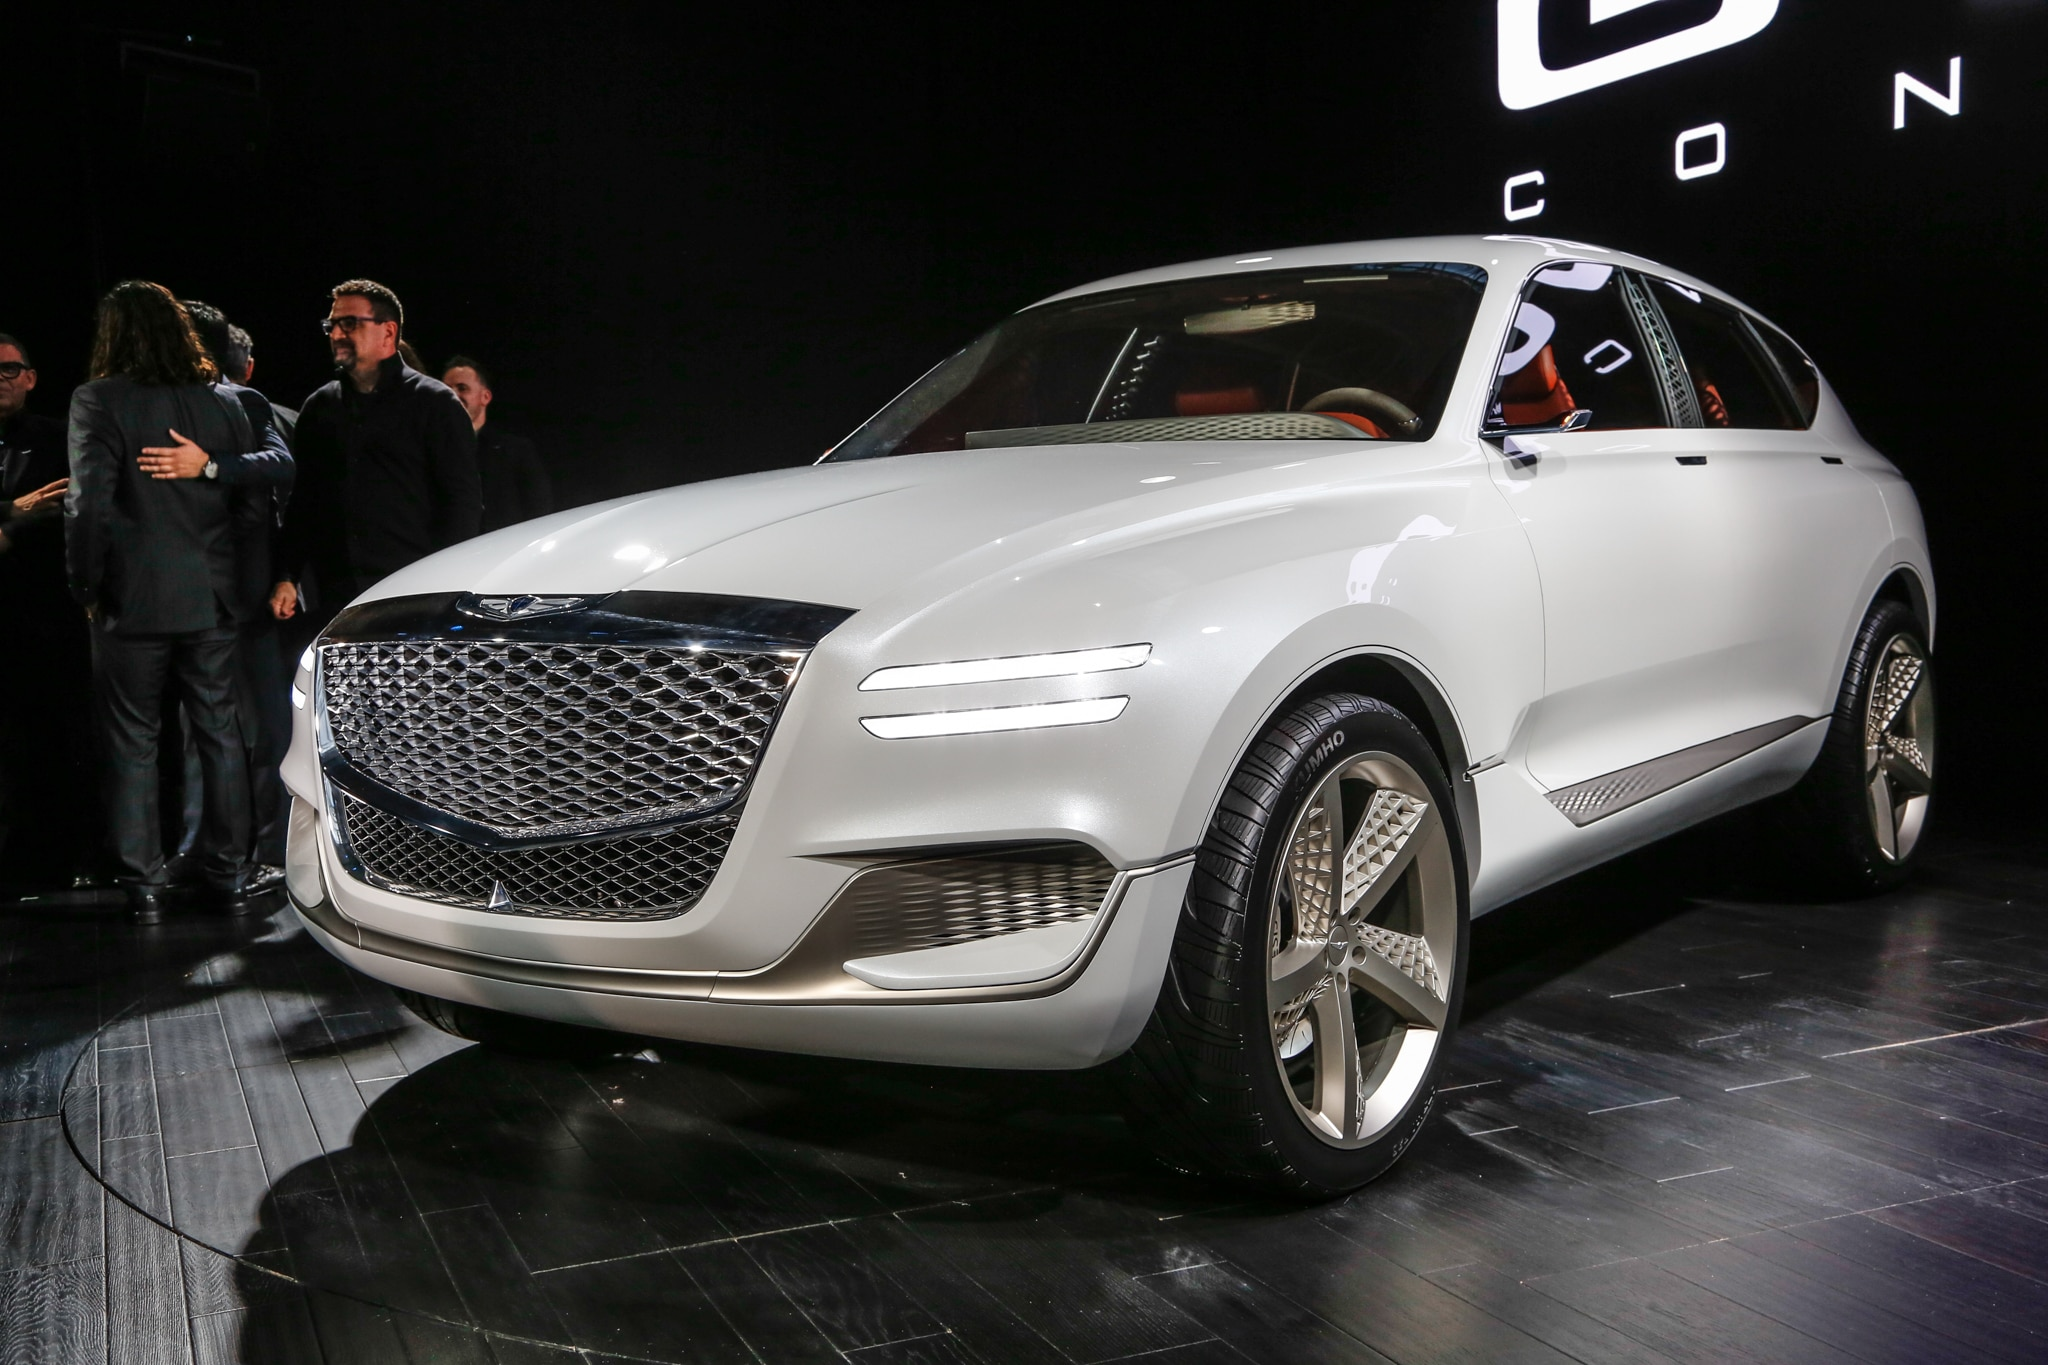 Future Of Genesis Involves SUVs And Sedans Hybrid Power